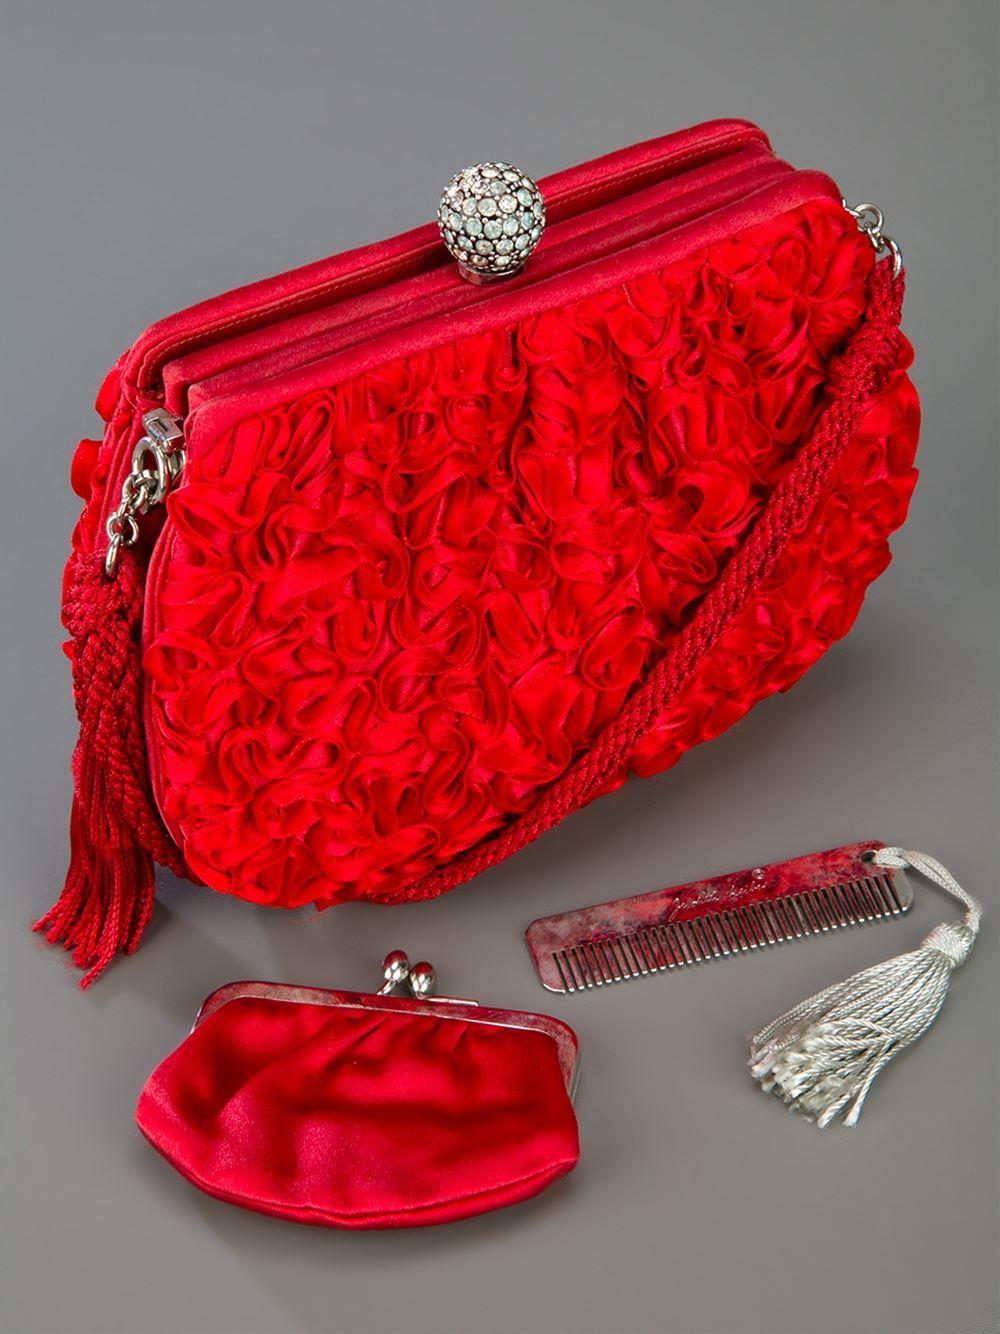 866fb1f28 tas merah | Sapatos e bolsas | Judith leiber, Fashion e Vintage